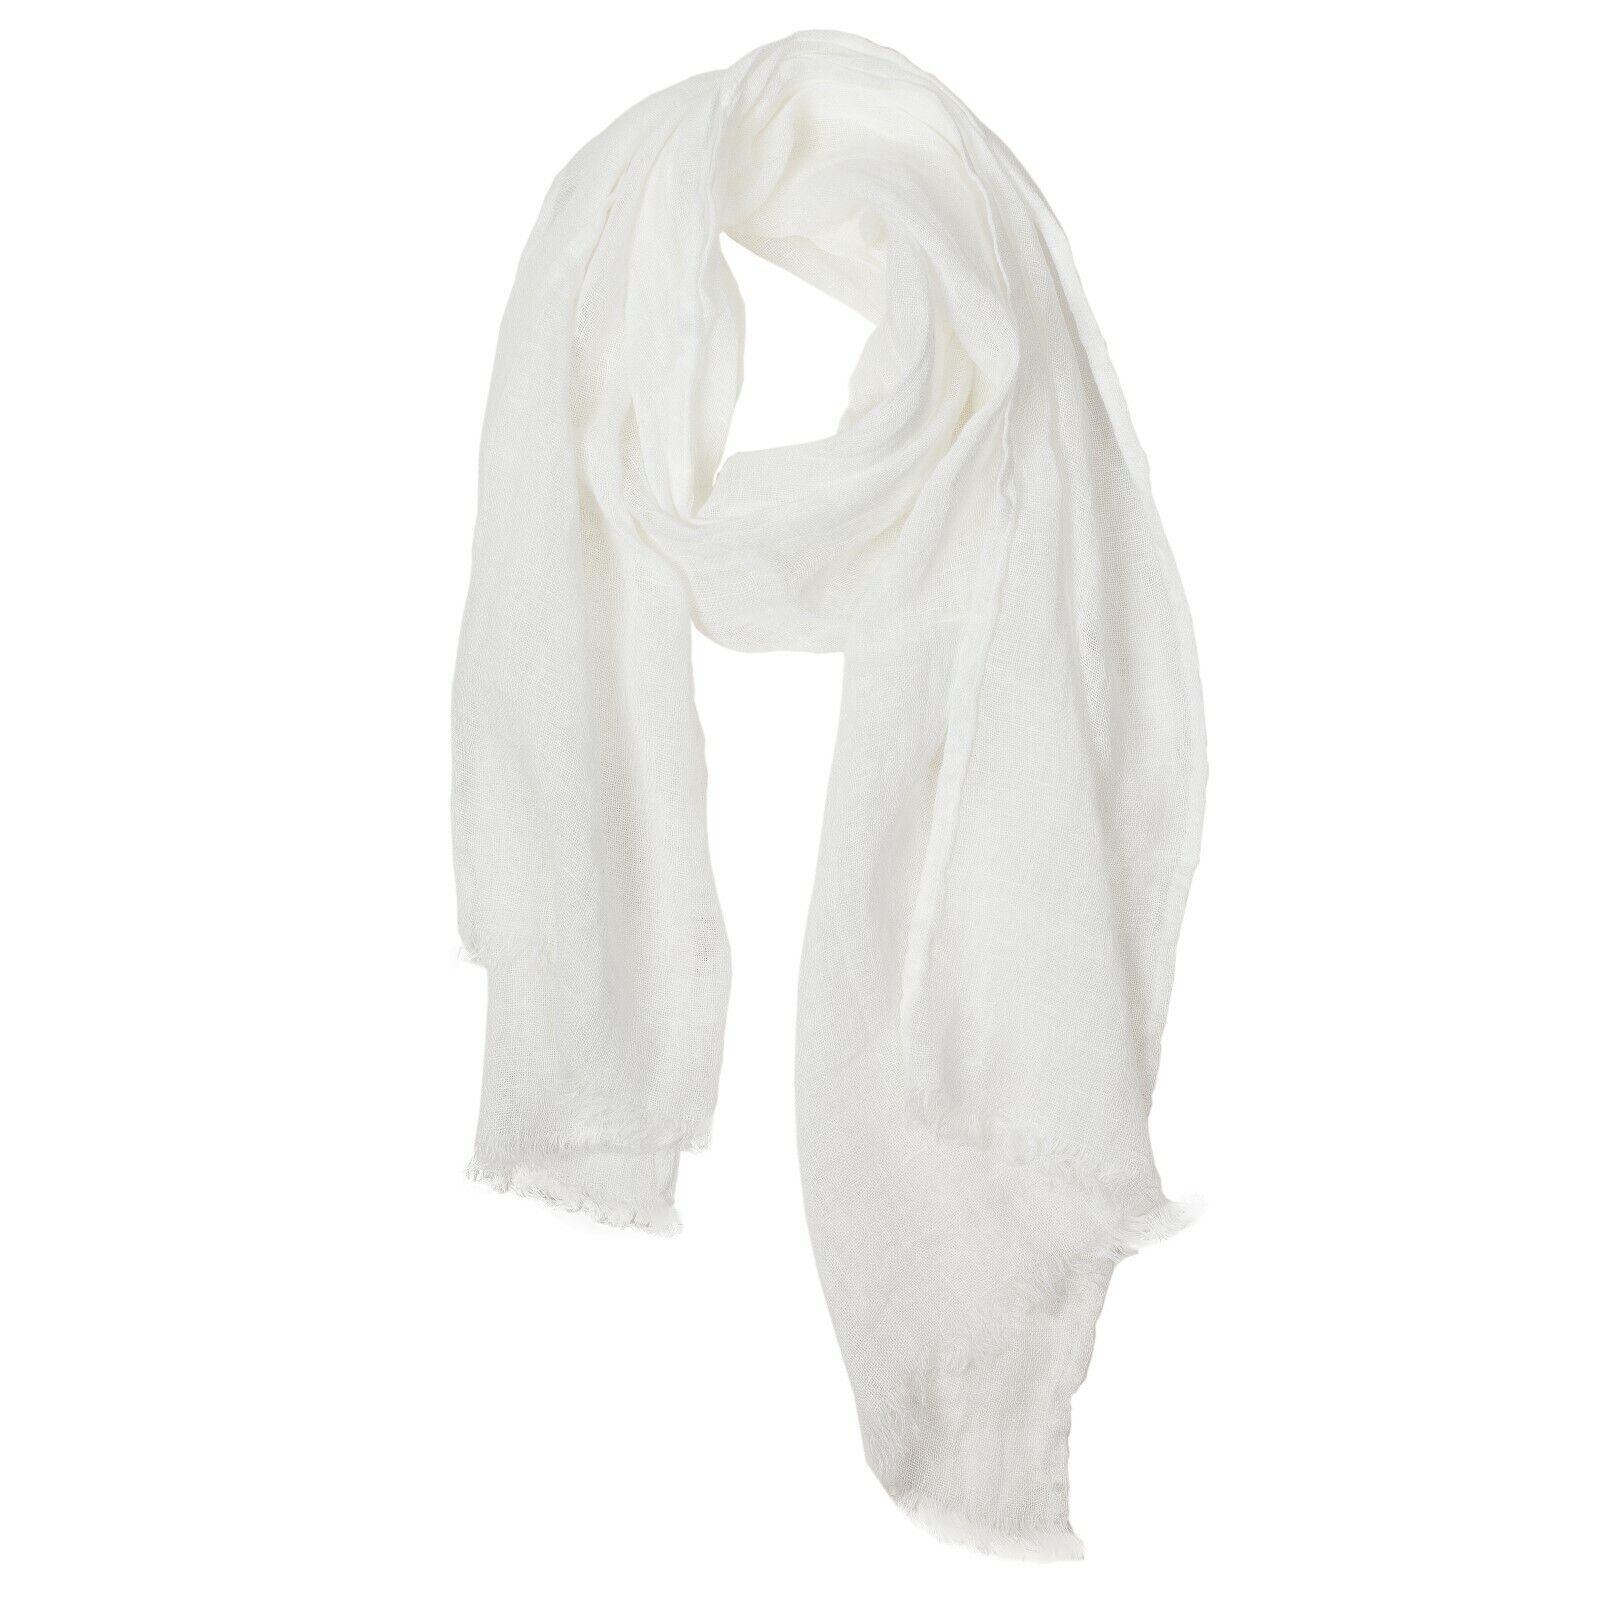 Women Big Tartan Scarf Wrap Shawl N4D7 creamy-white